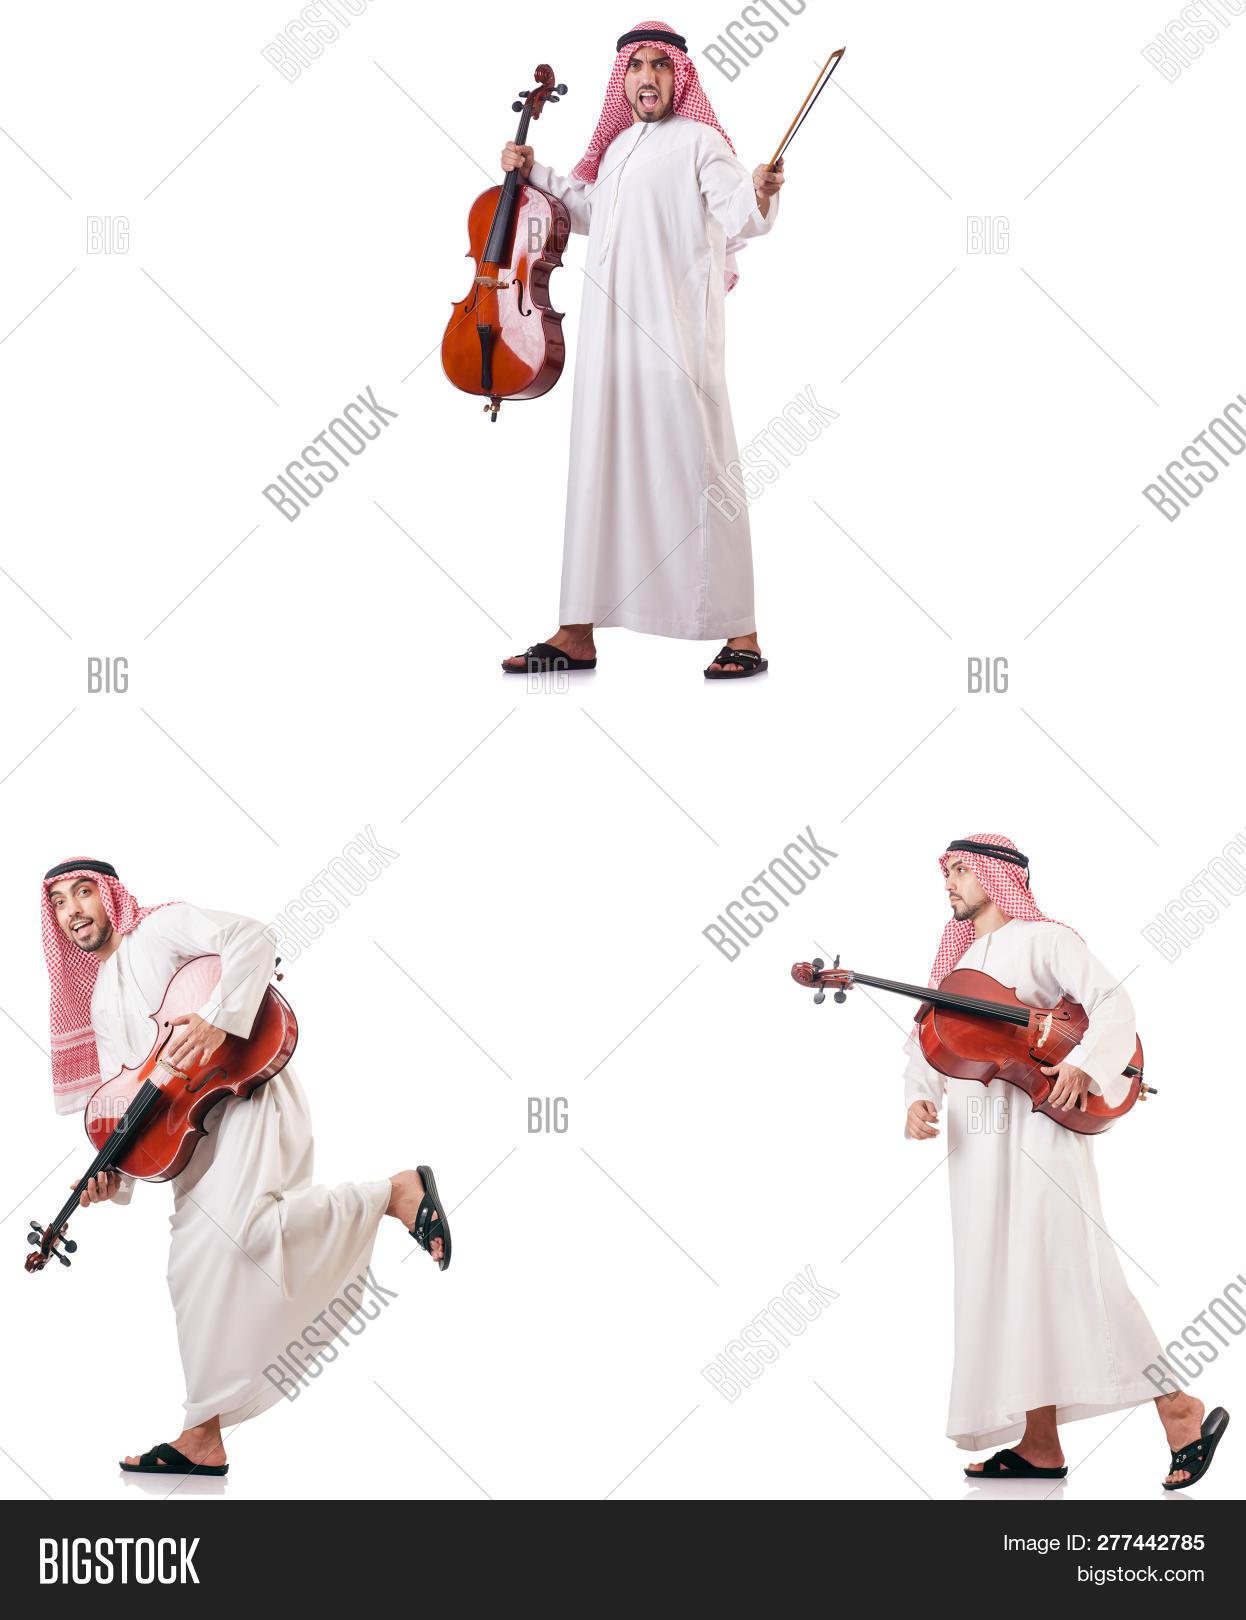 Arab Man Playing Cello Image & Photo (Free Trial) | Bigstock